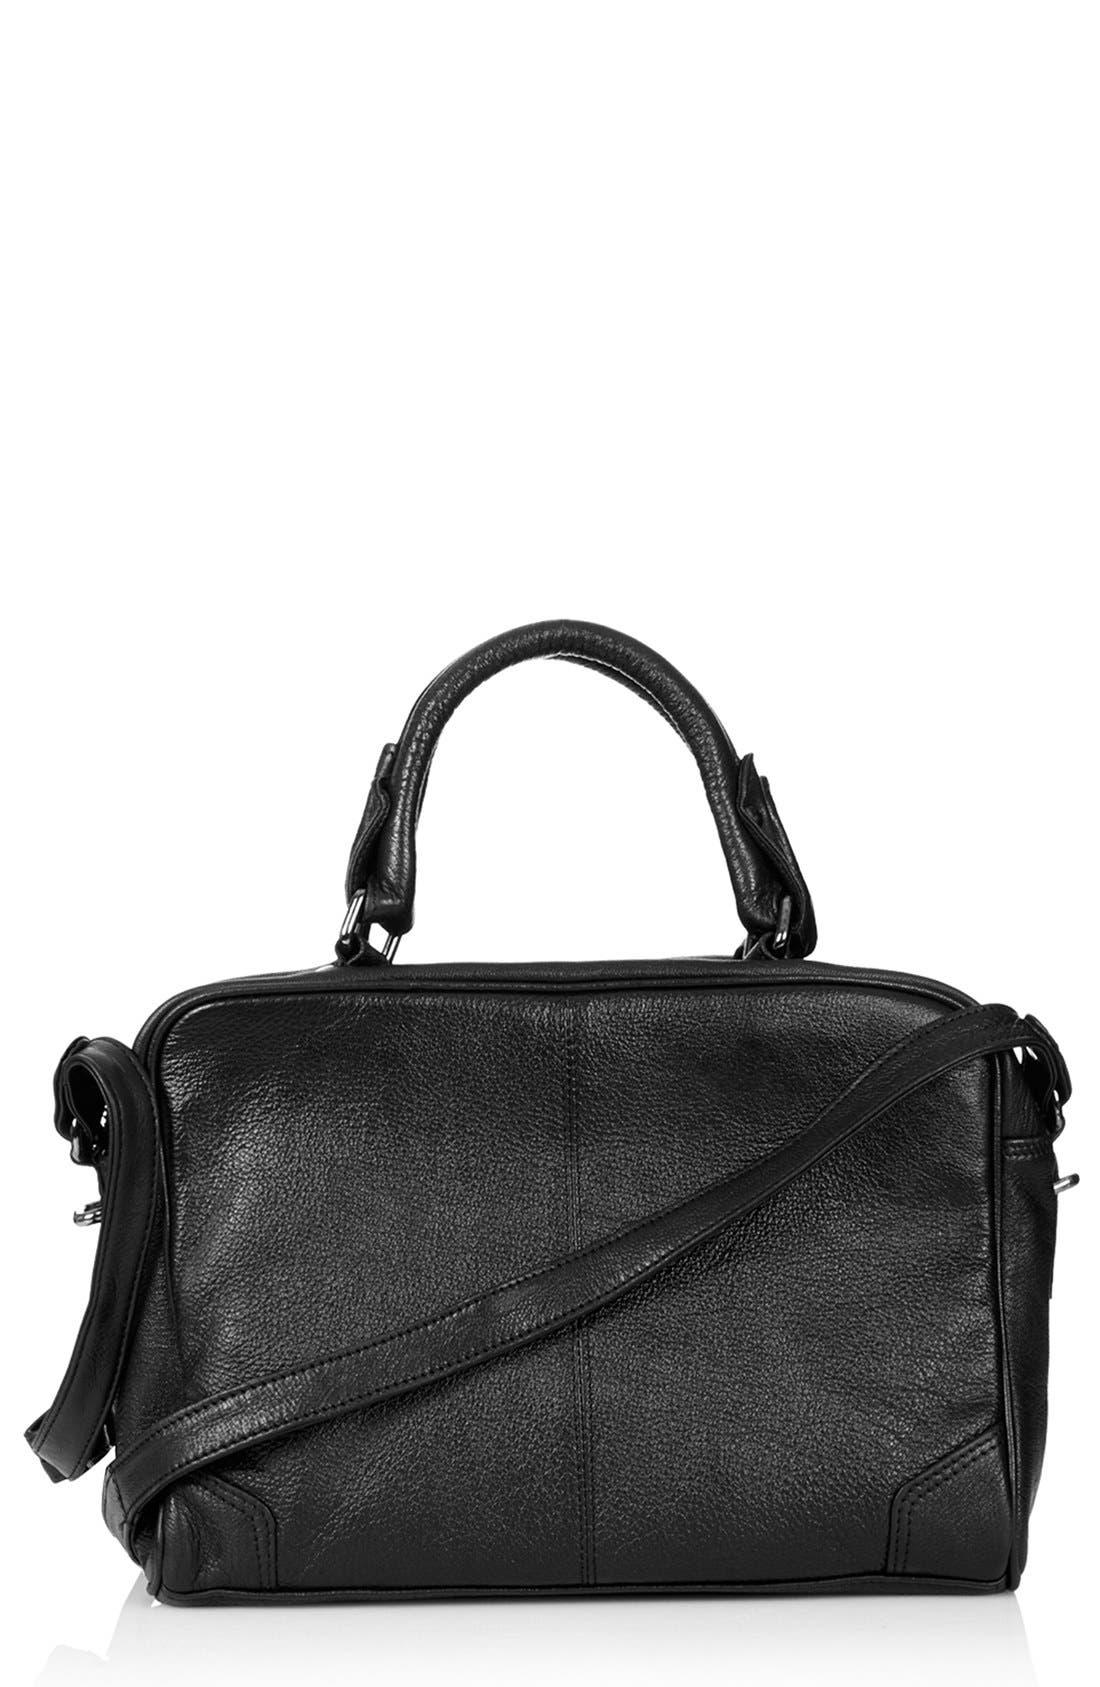 Alternate Image 1 Selected - Topshop 'Medium' Leather Satchel